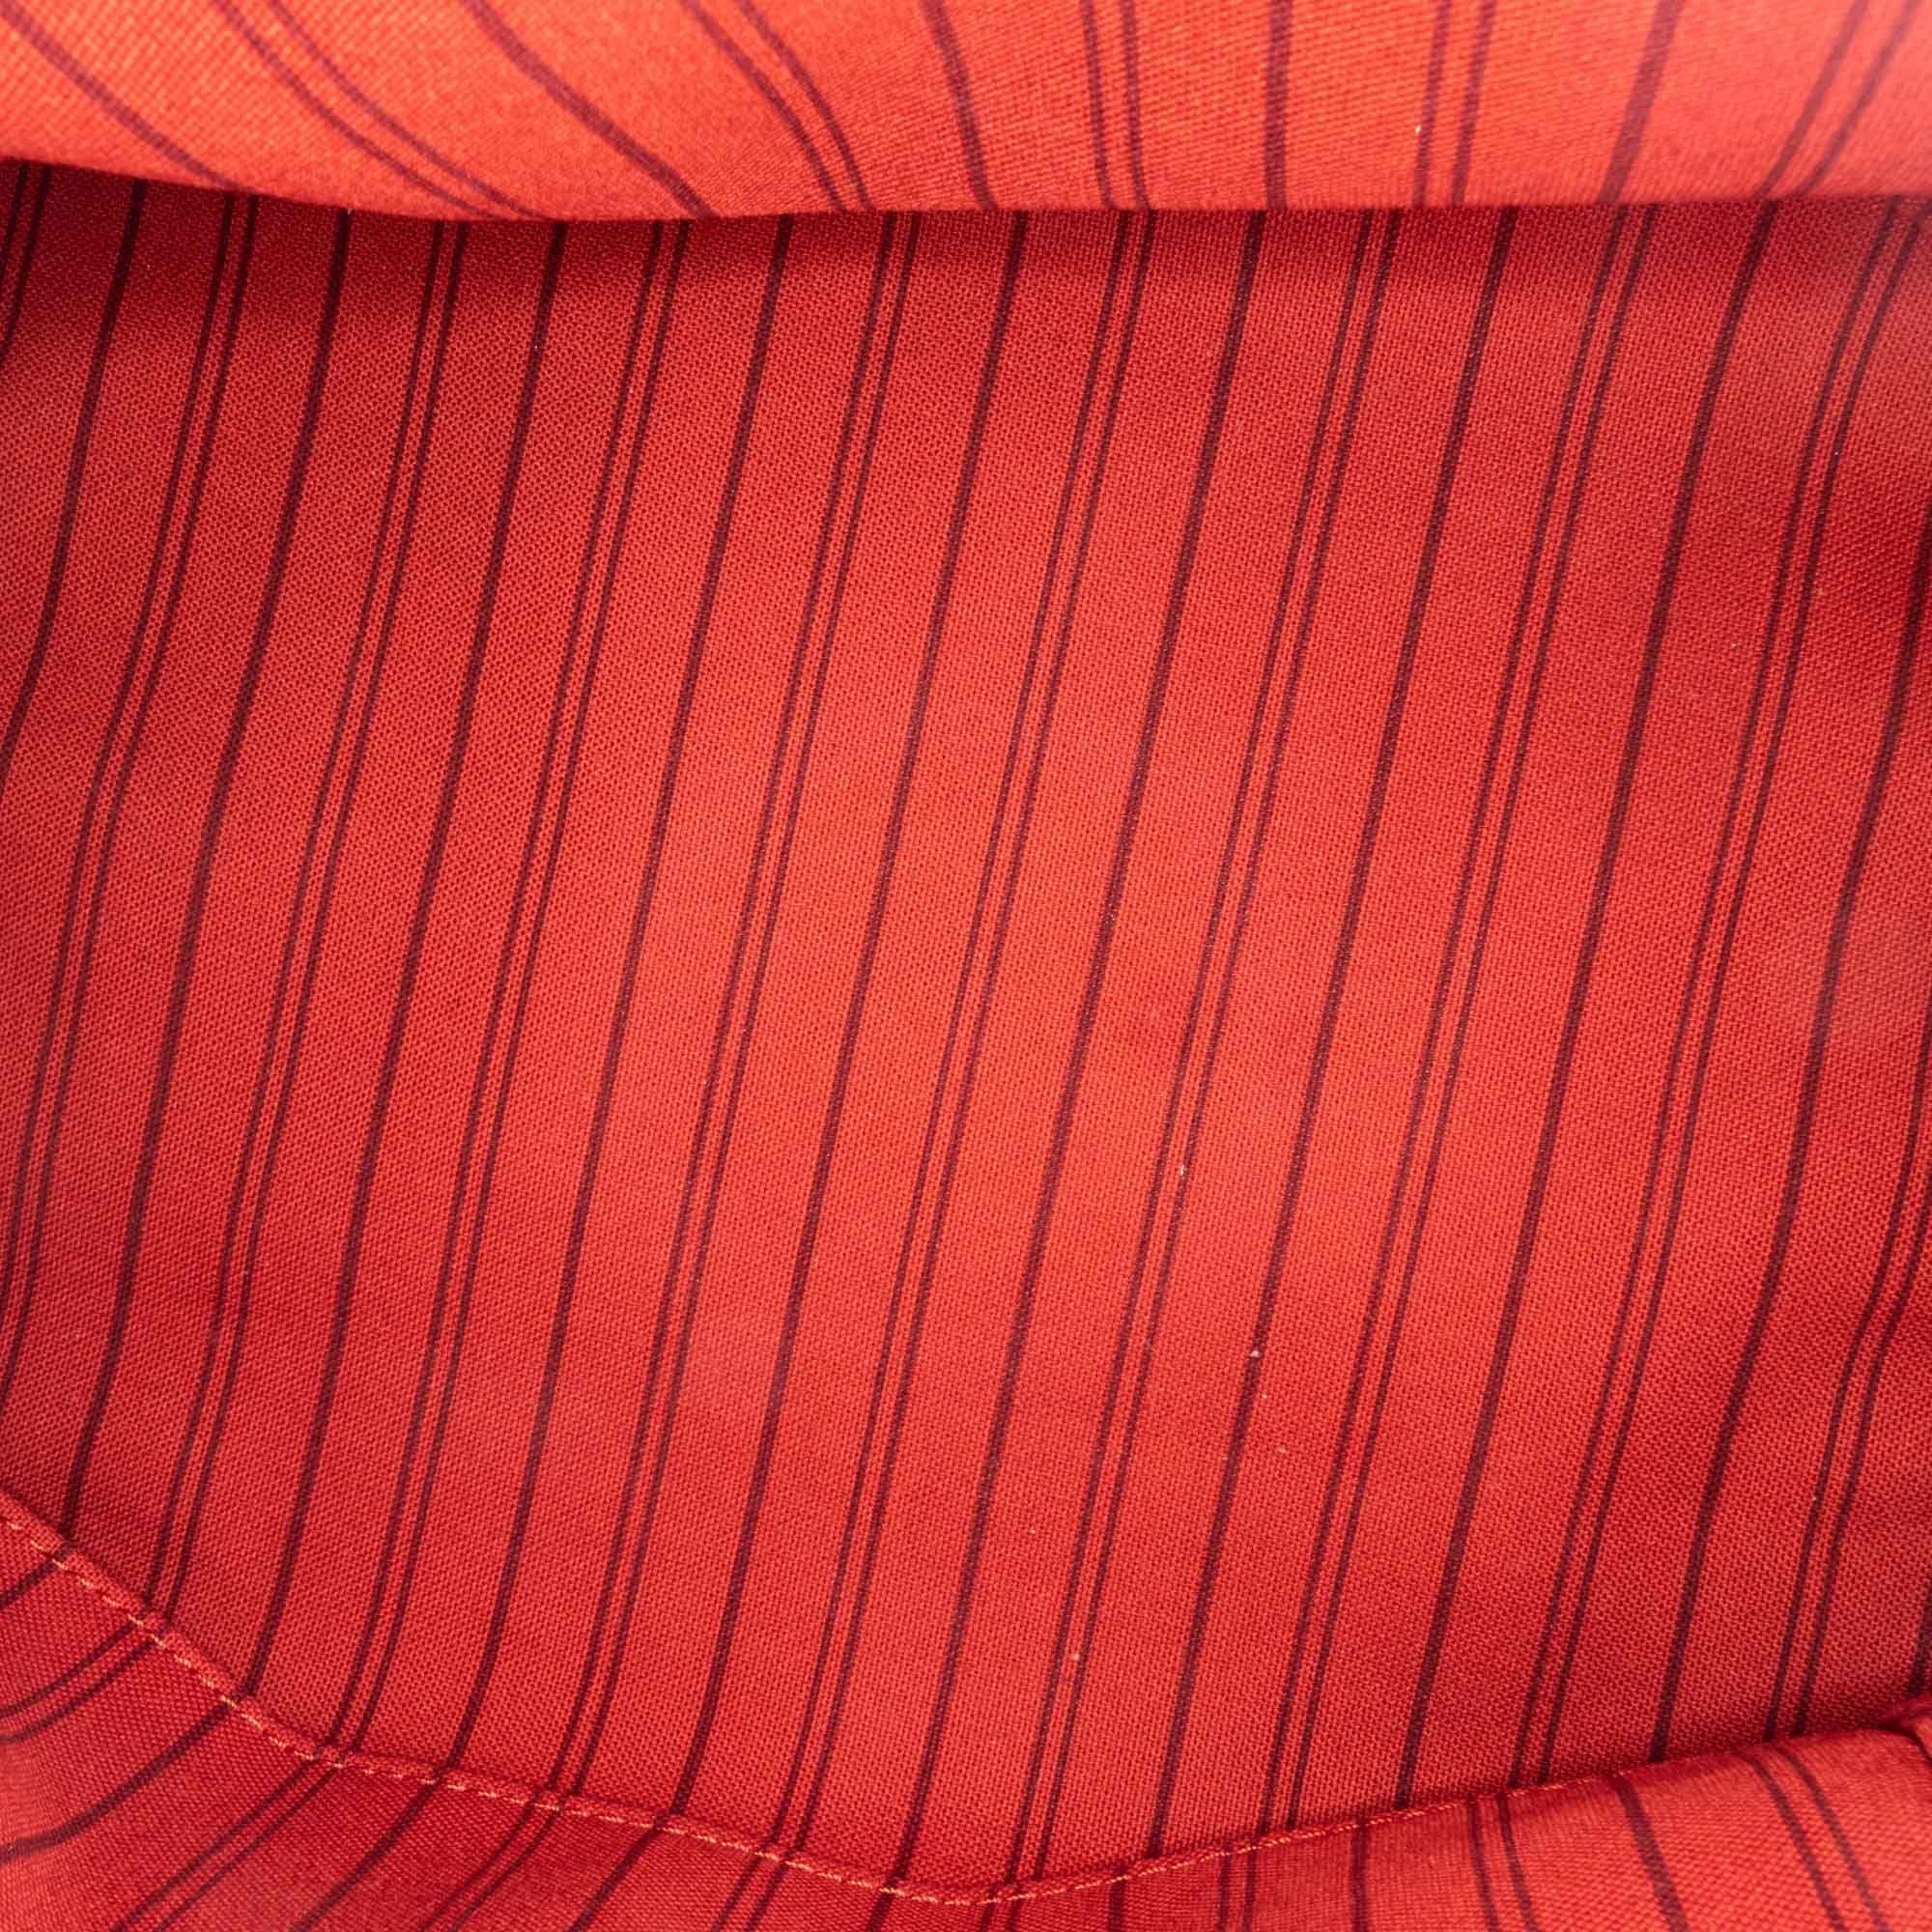 Vintage Louis Vuitton Empreinte Lumineuse PM Red